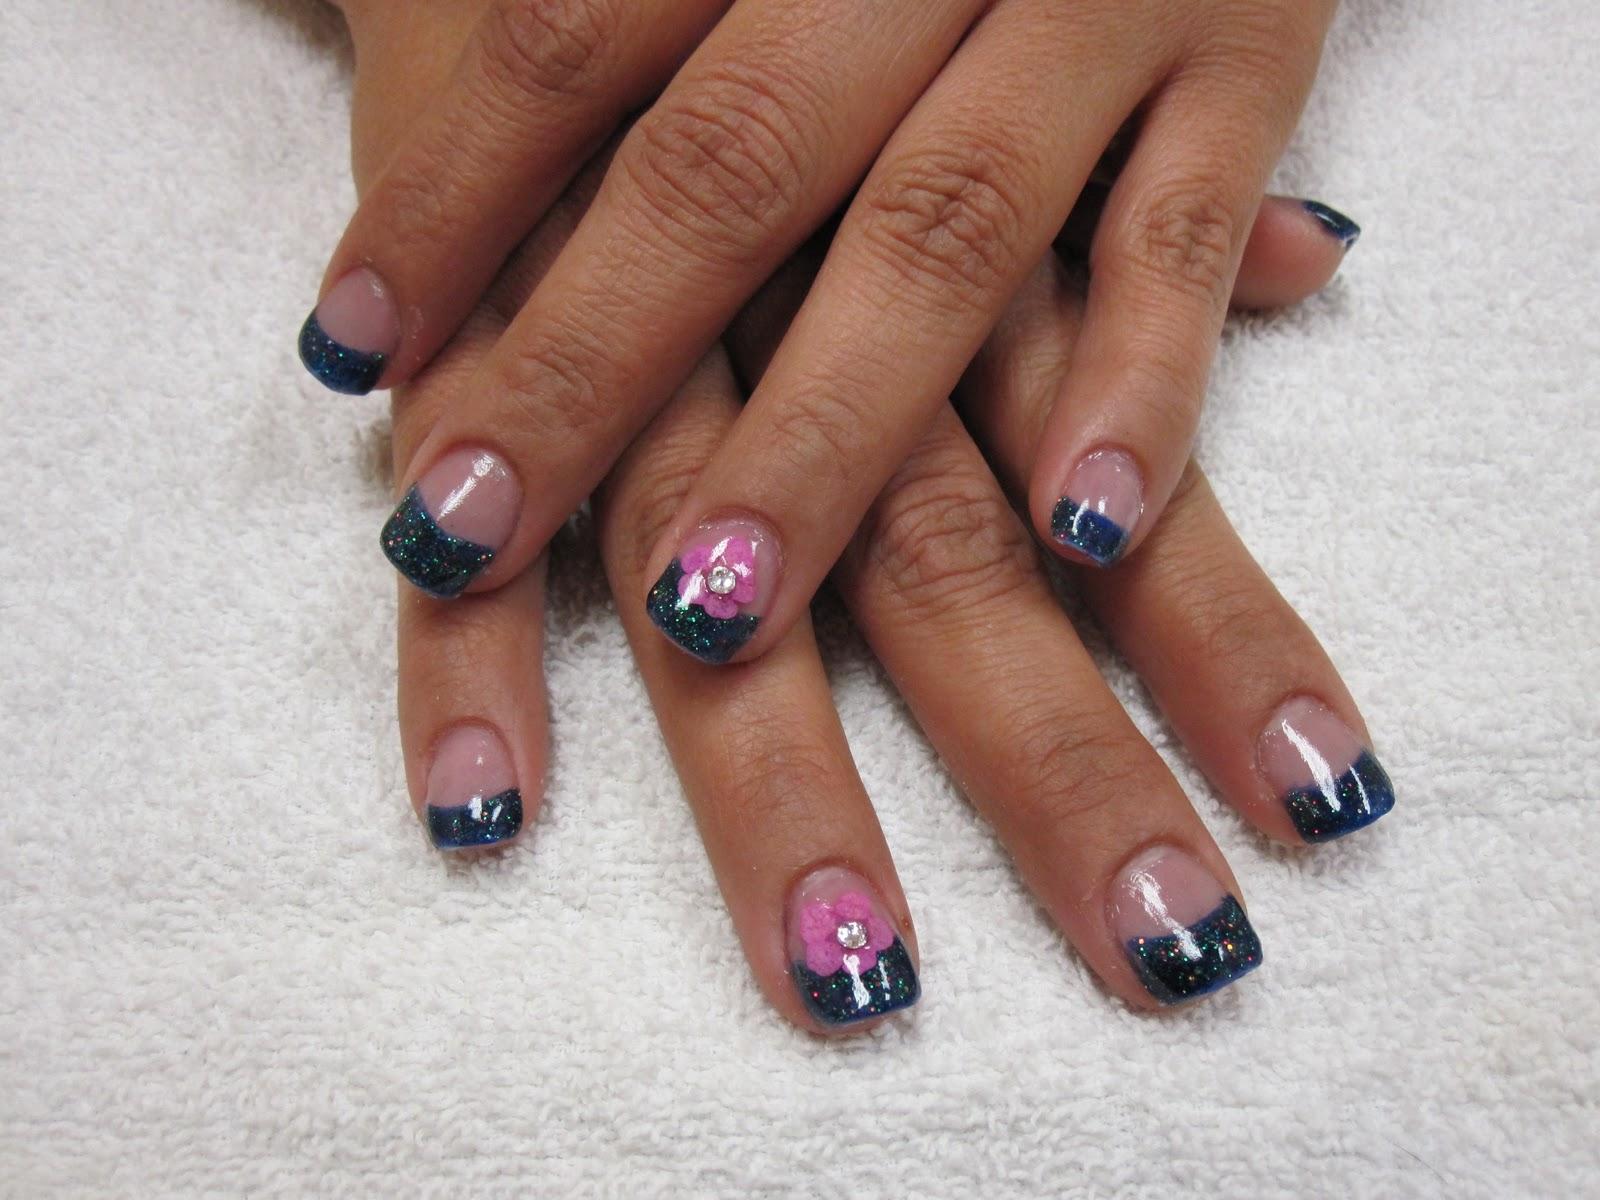 Nail art las vegas embedded flower nails embedded flower nails prinsesfo Gallery